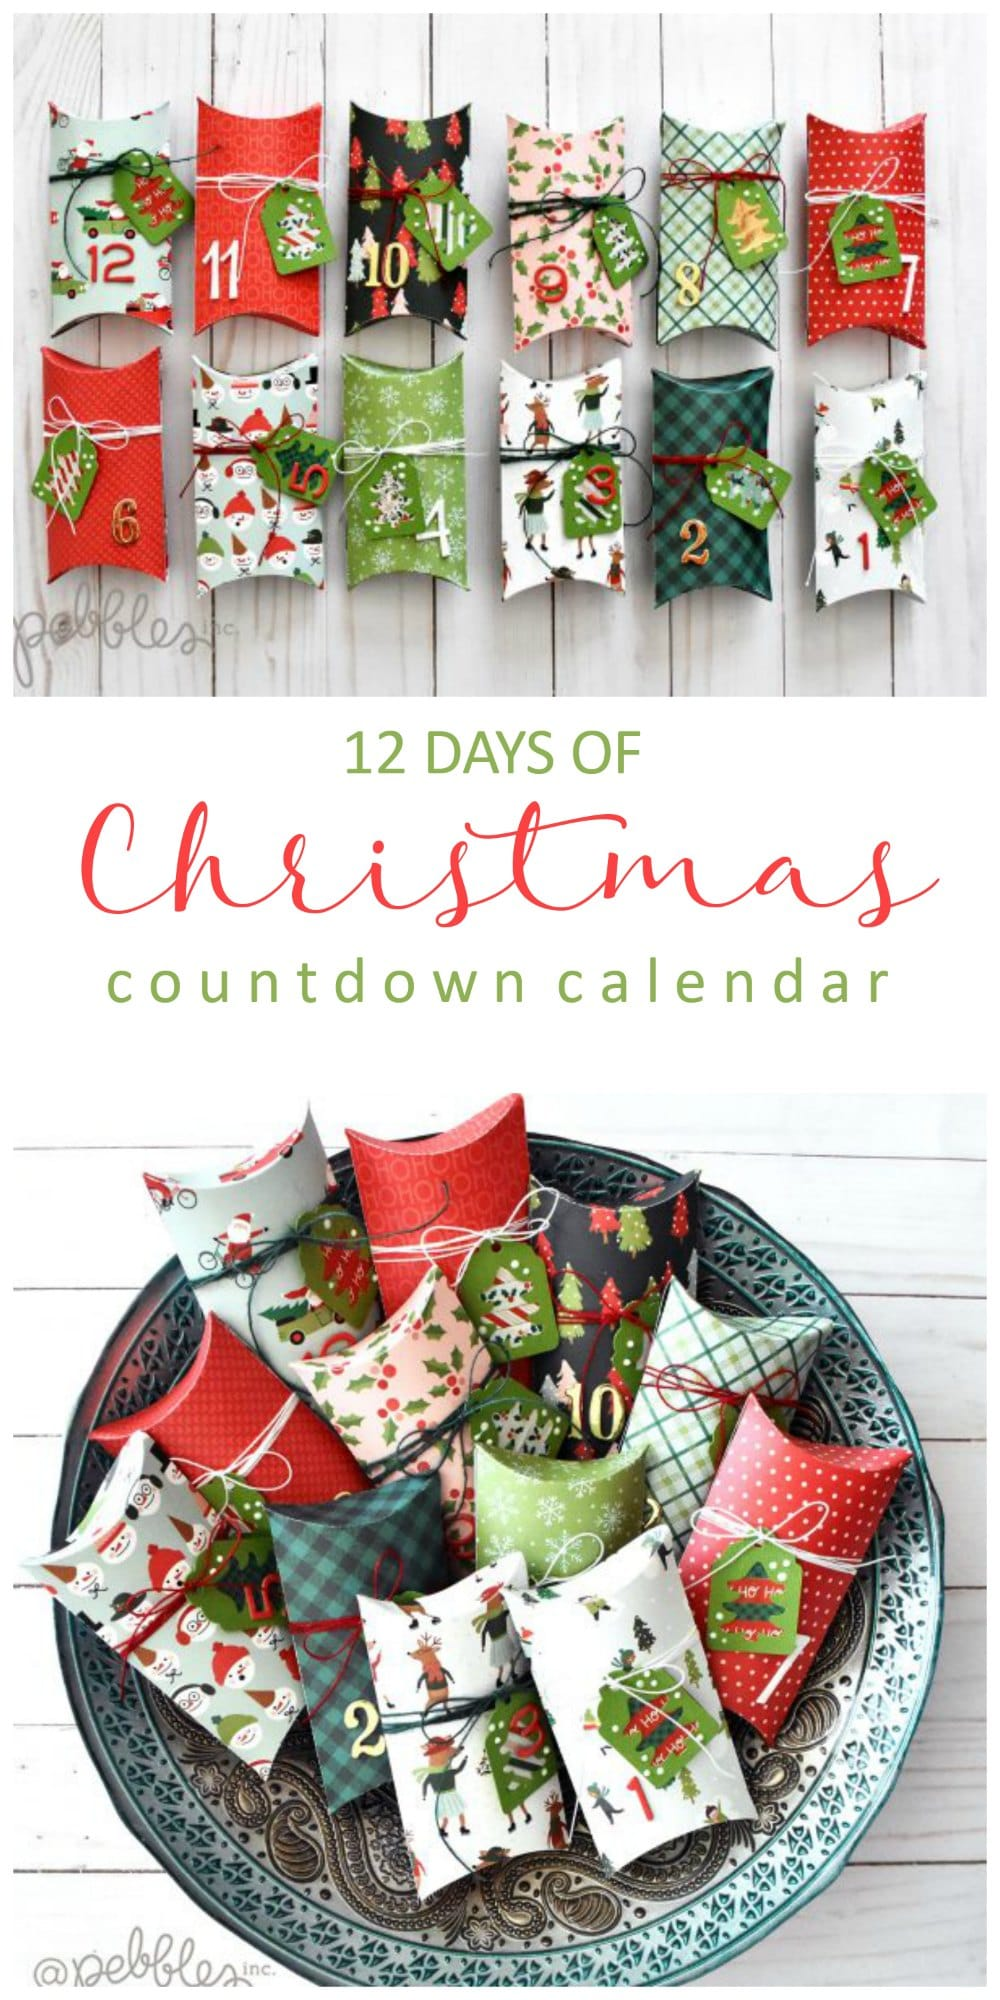 12 Days Of Christmas Paper Countdown Calendar Diy